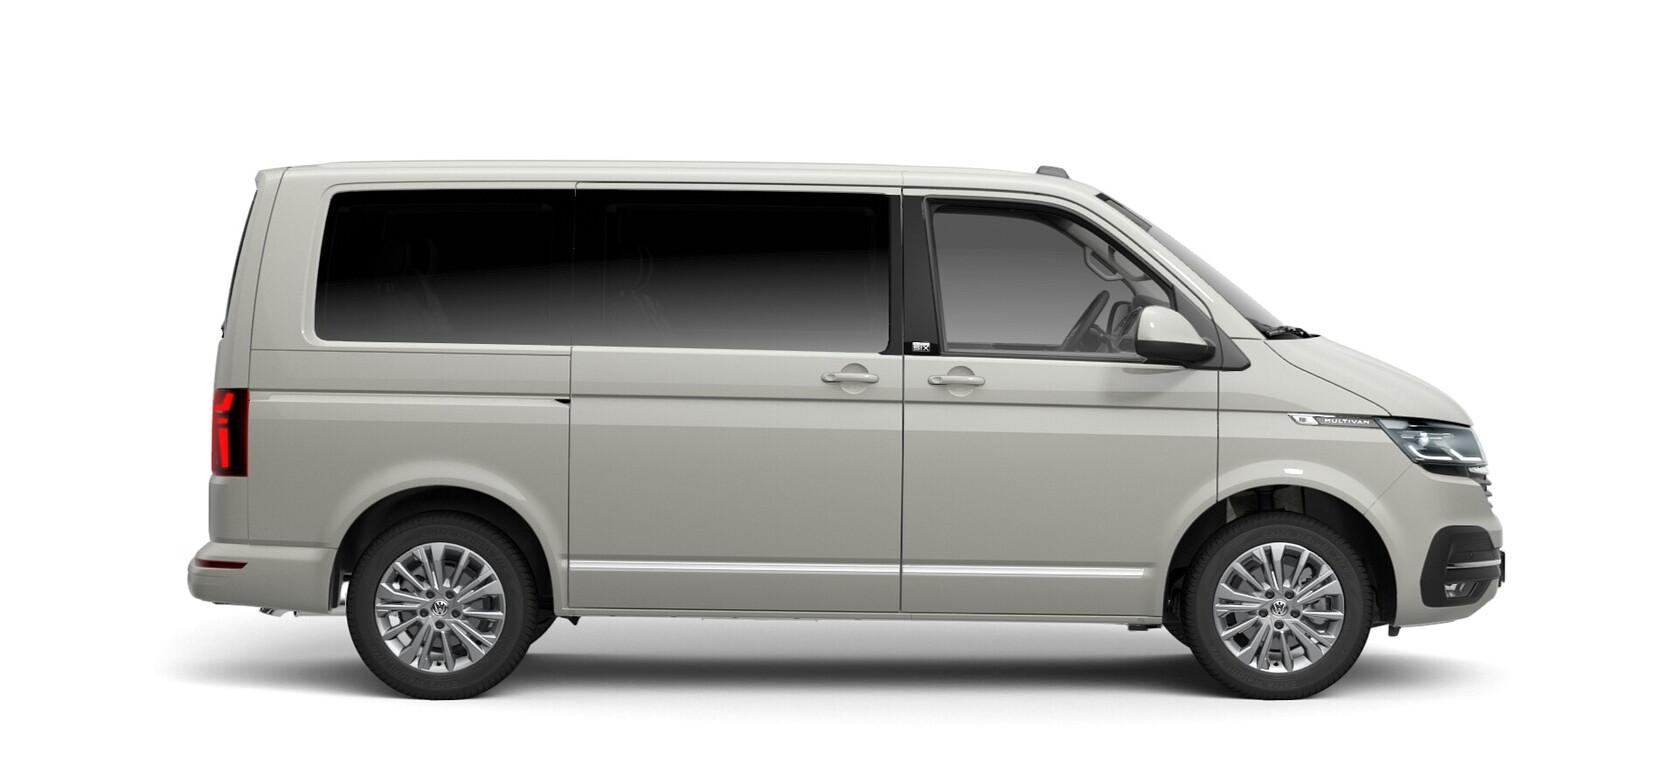 VW Multivan 6.1 Generation Six Lackierung Ascot Grau